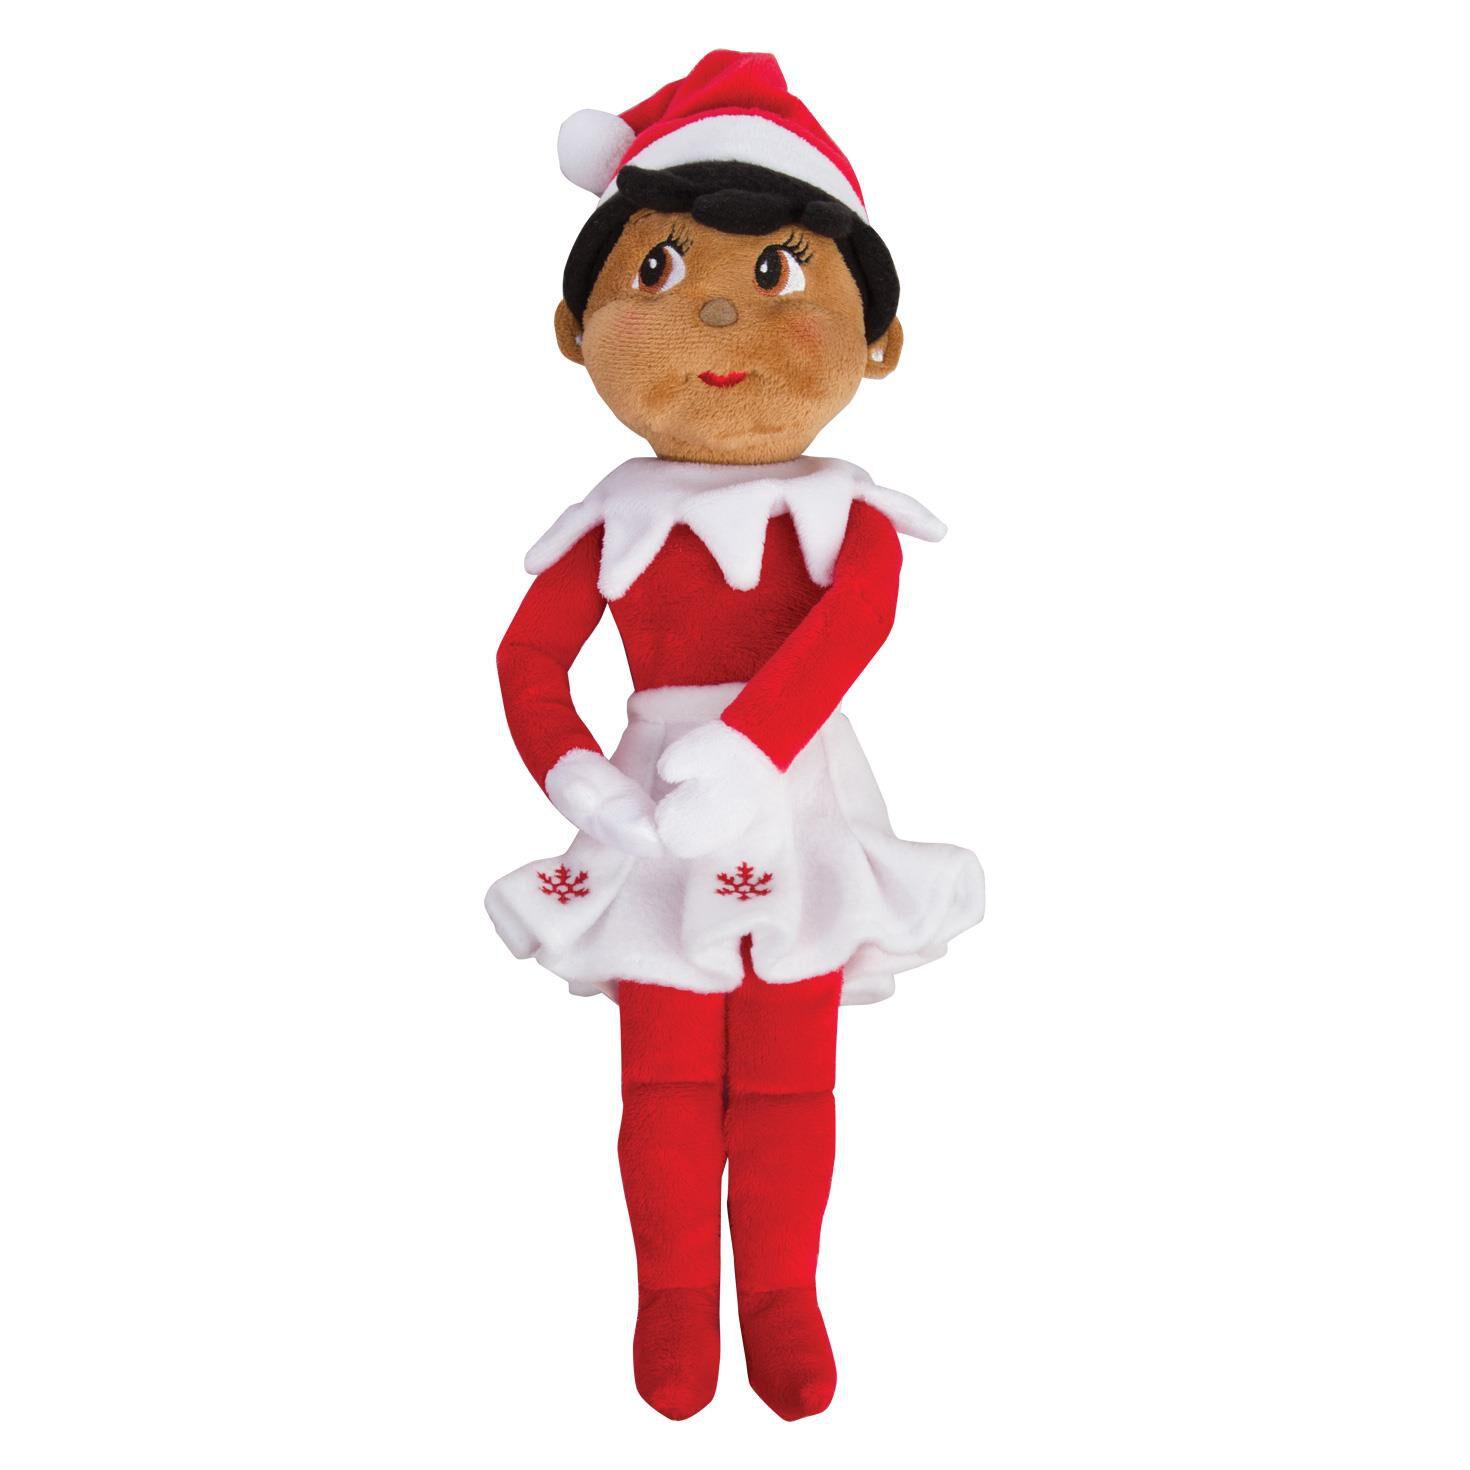 The Elf on the Shelf Girl Elf Plushee Pal Dark Skin Dolls